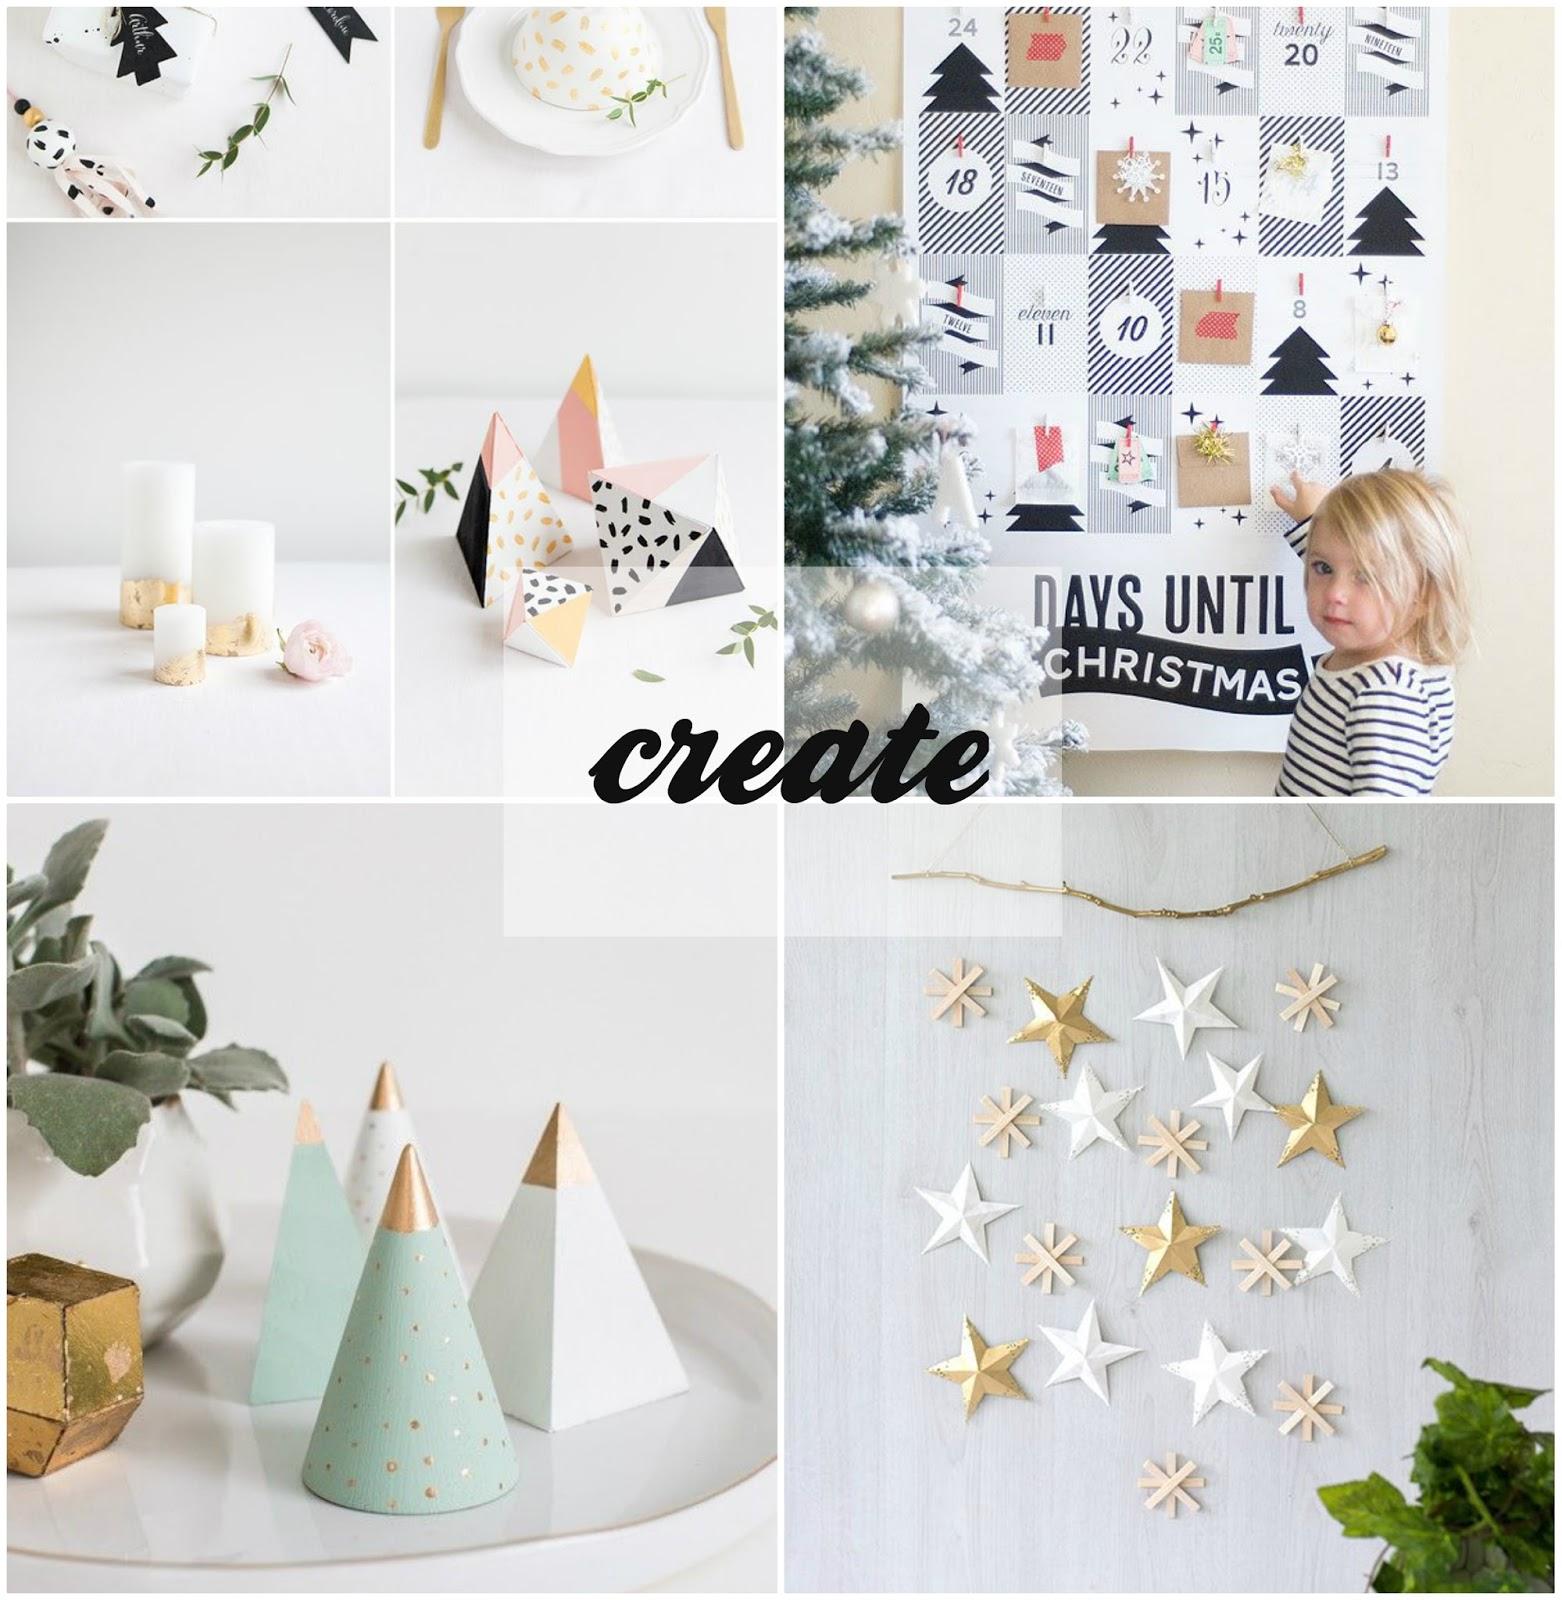 Idee Creative Per Natale wayhome:: : diy | idee creative per natale